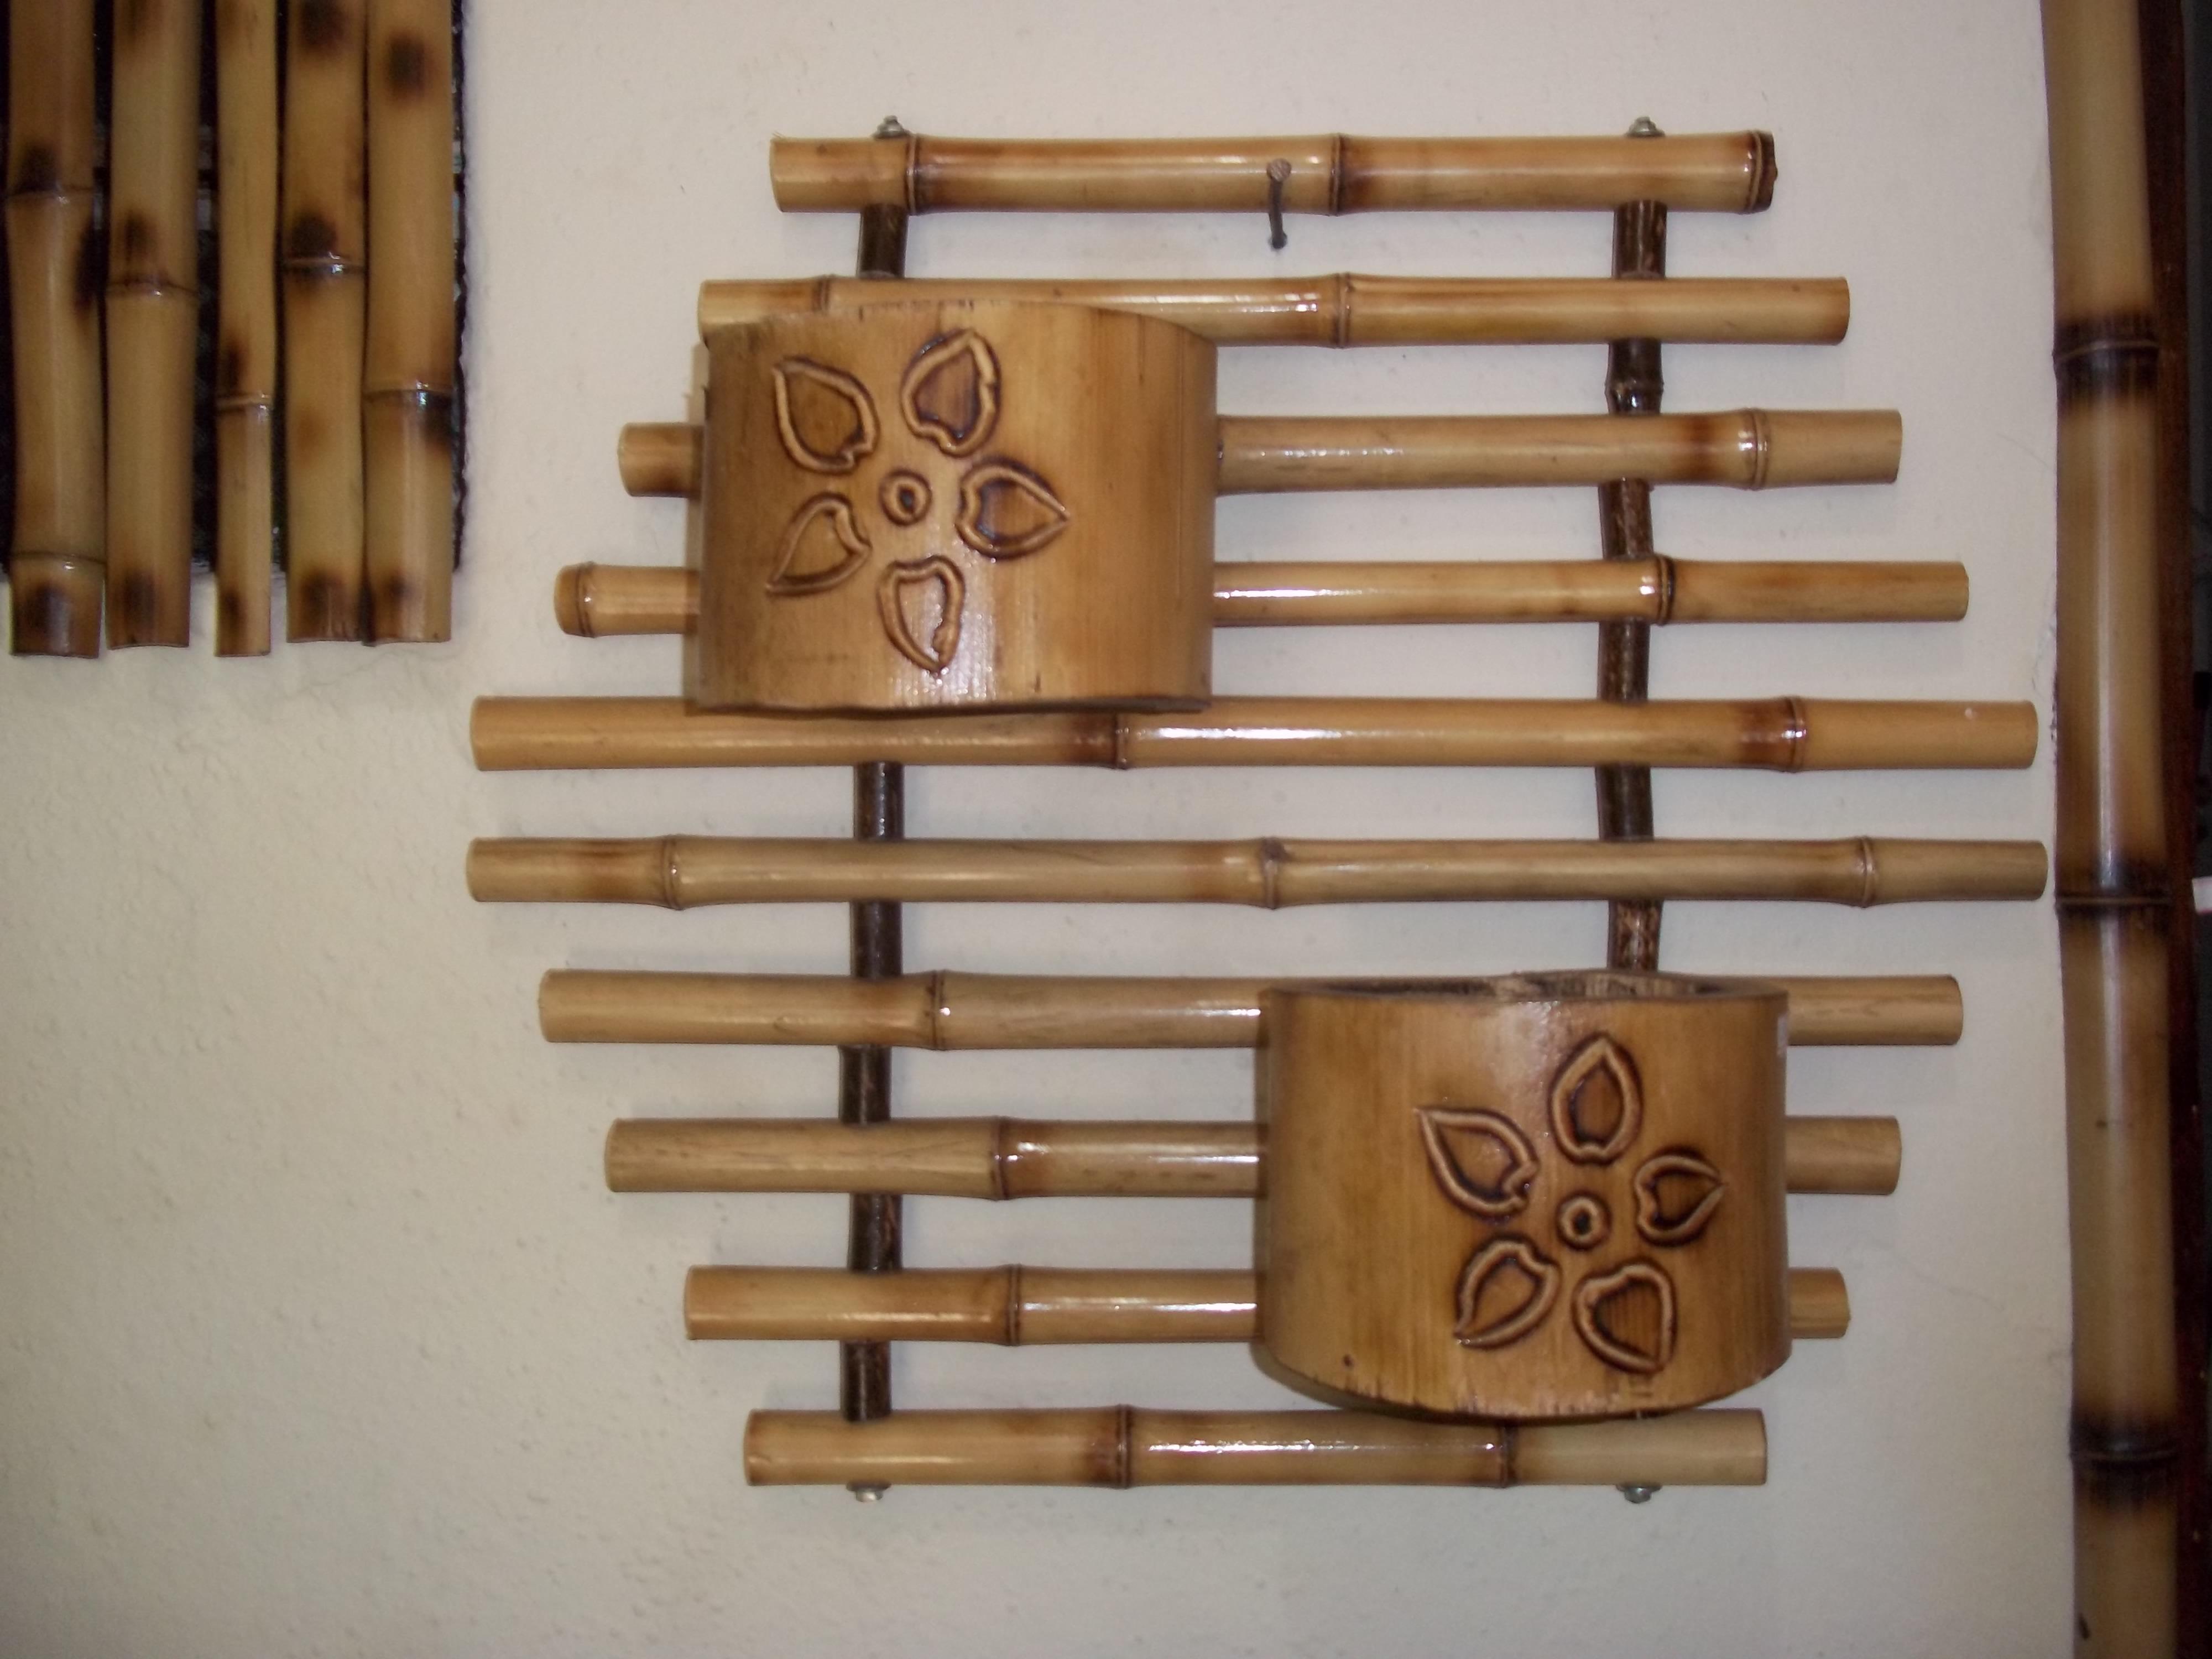 artesanato de bambu para jardim: de bambu floreira de bambu floreira de bambu floreira de bambu